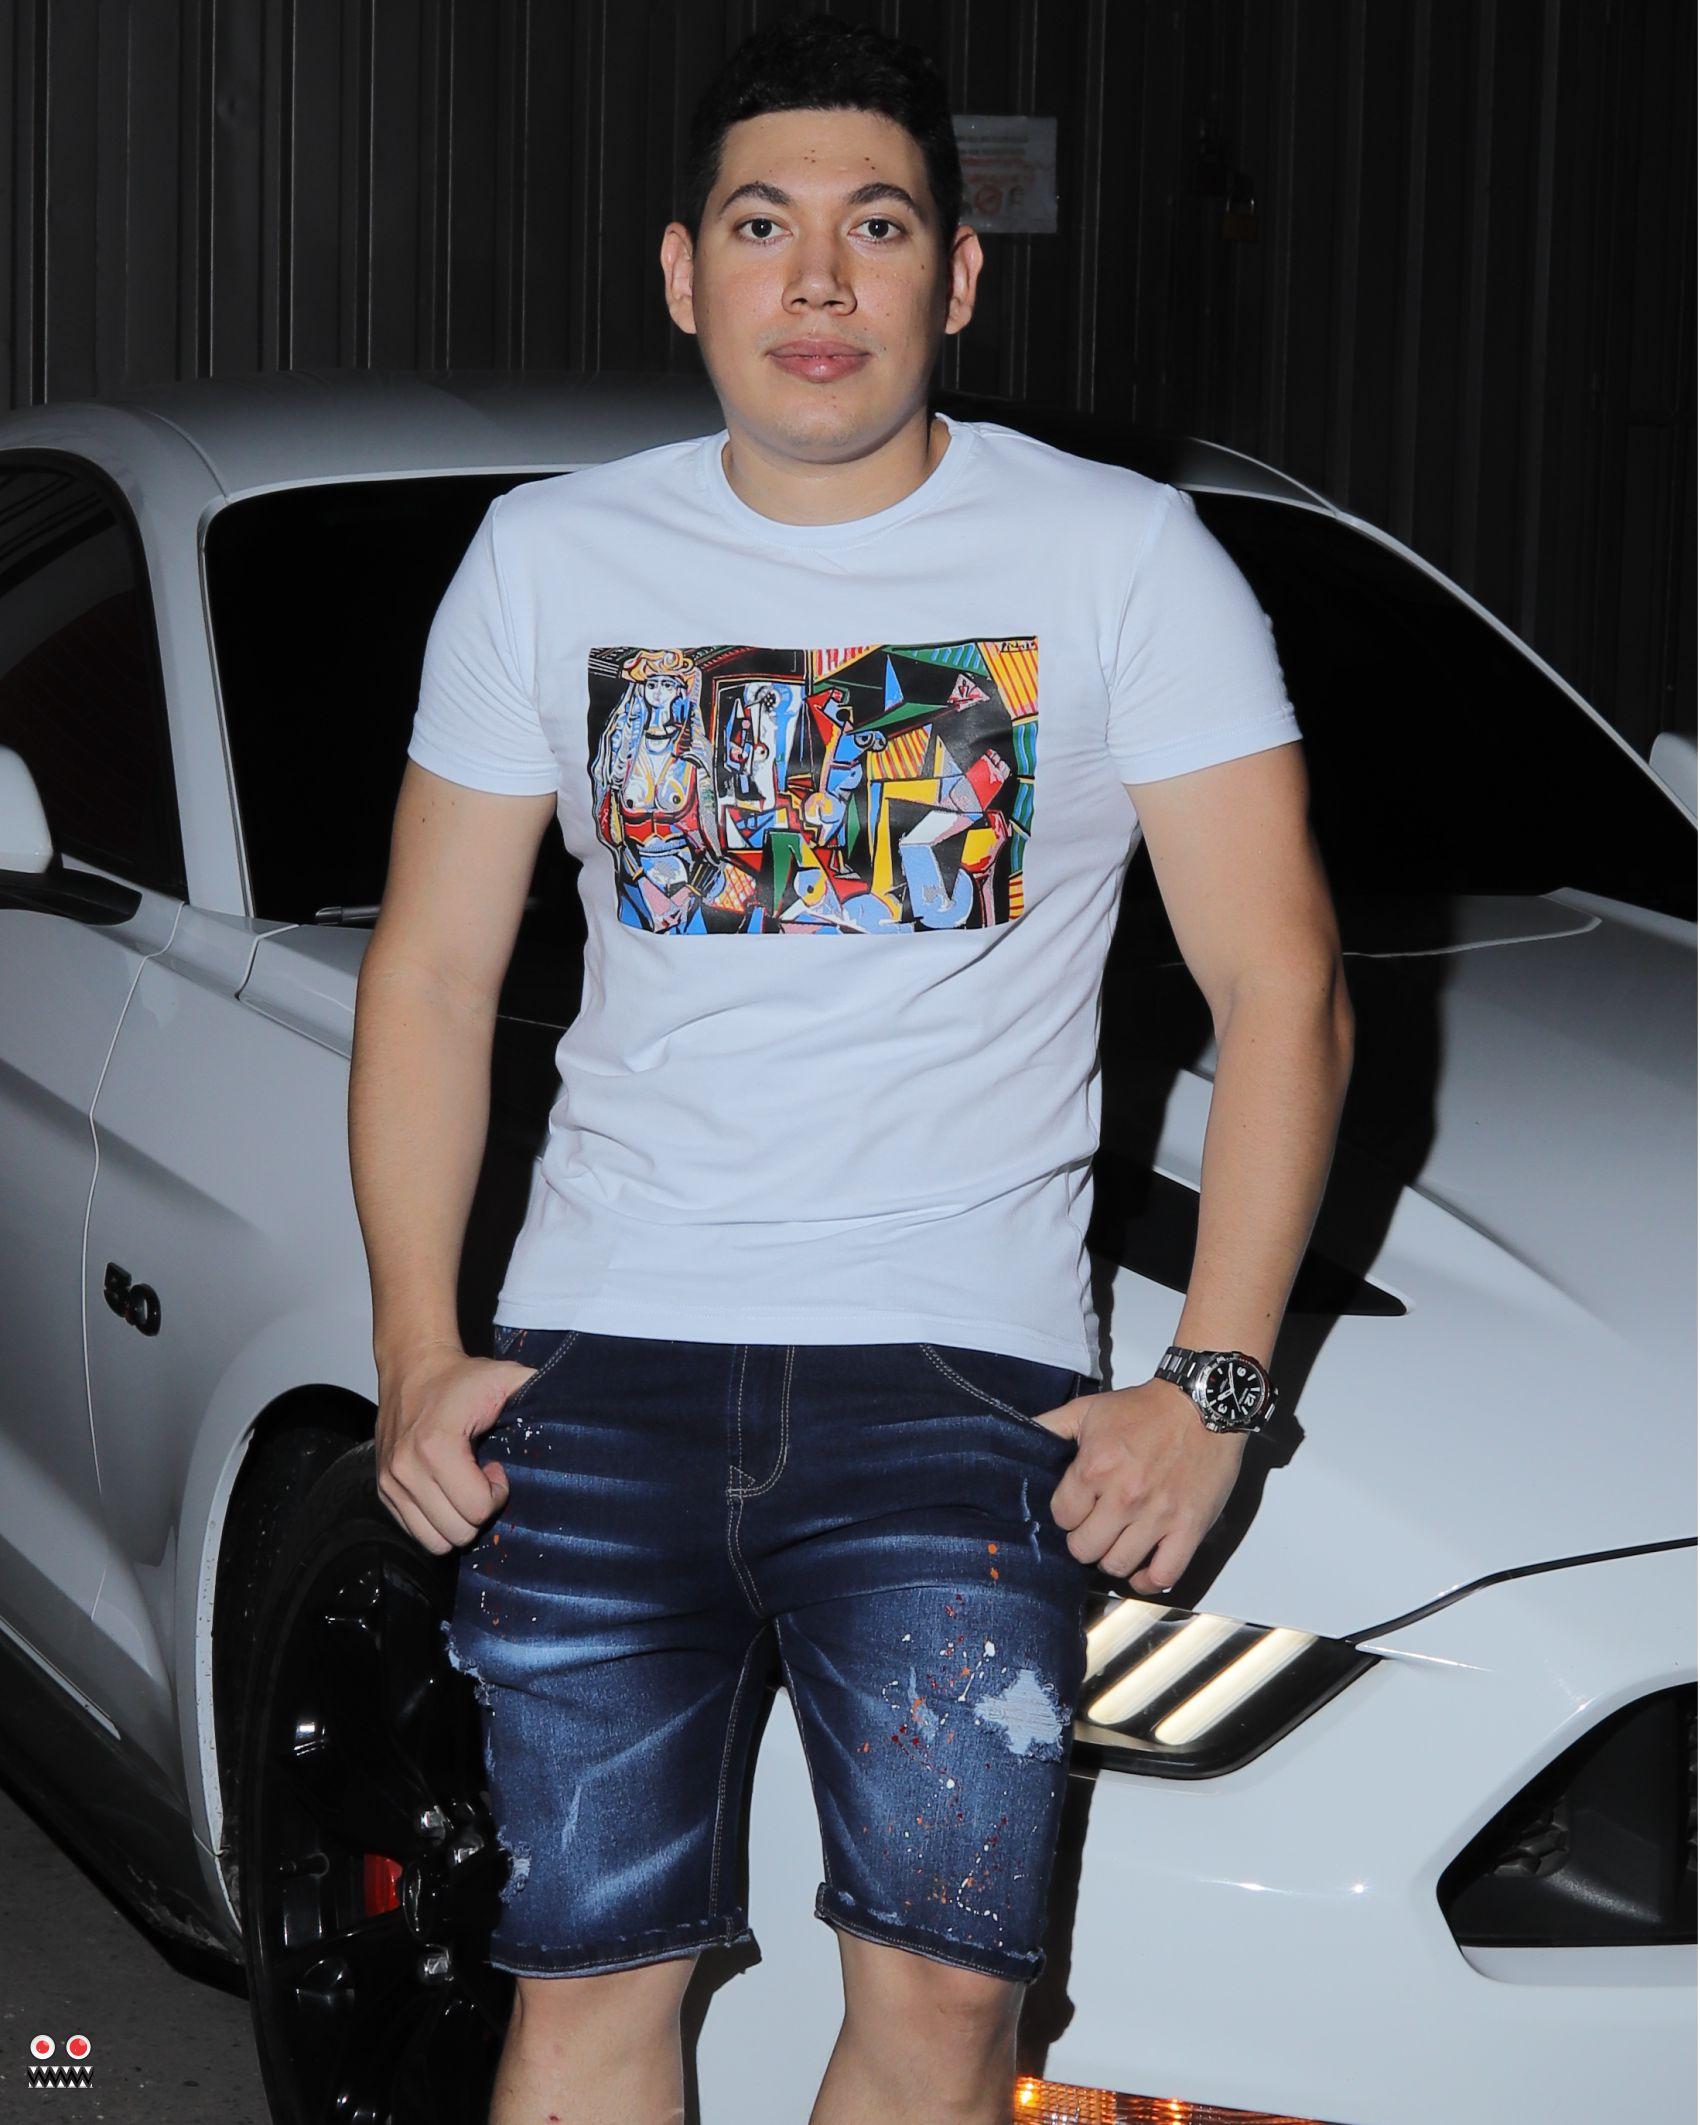 ref 1679 2 camiseta blanco cubismo, tela en algodon Tallas S-M-L-XL. $48.000.